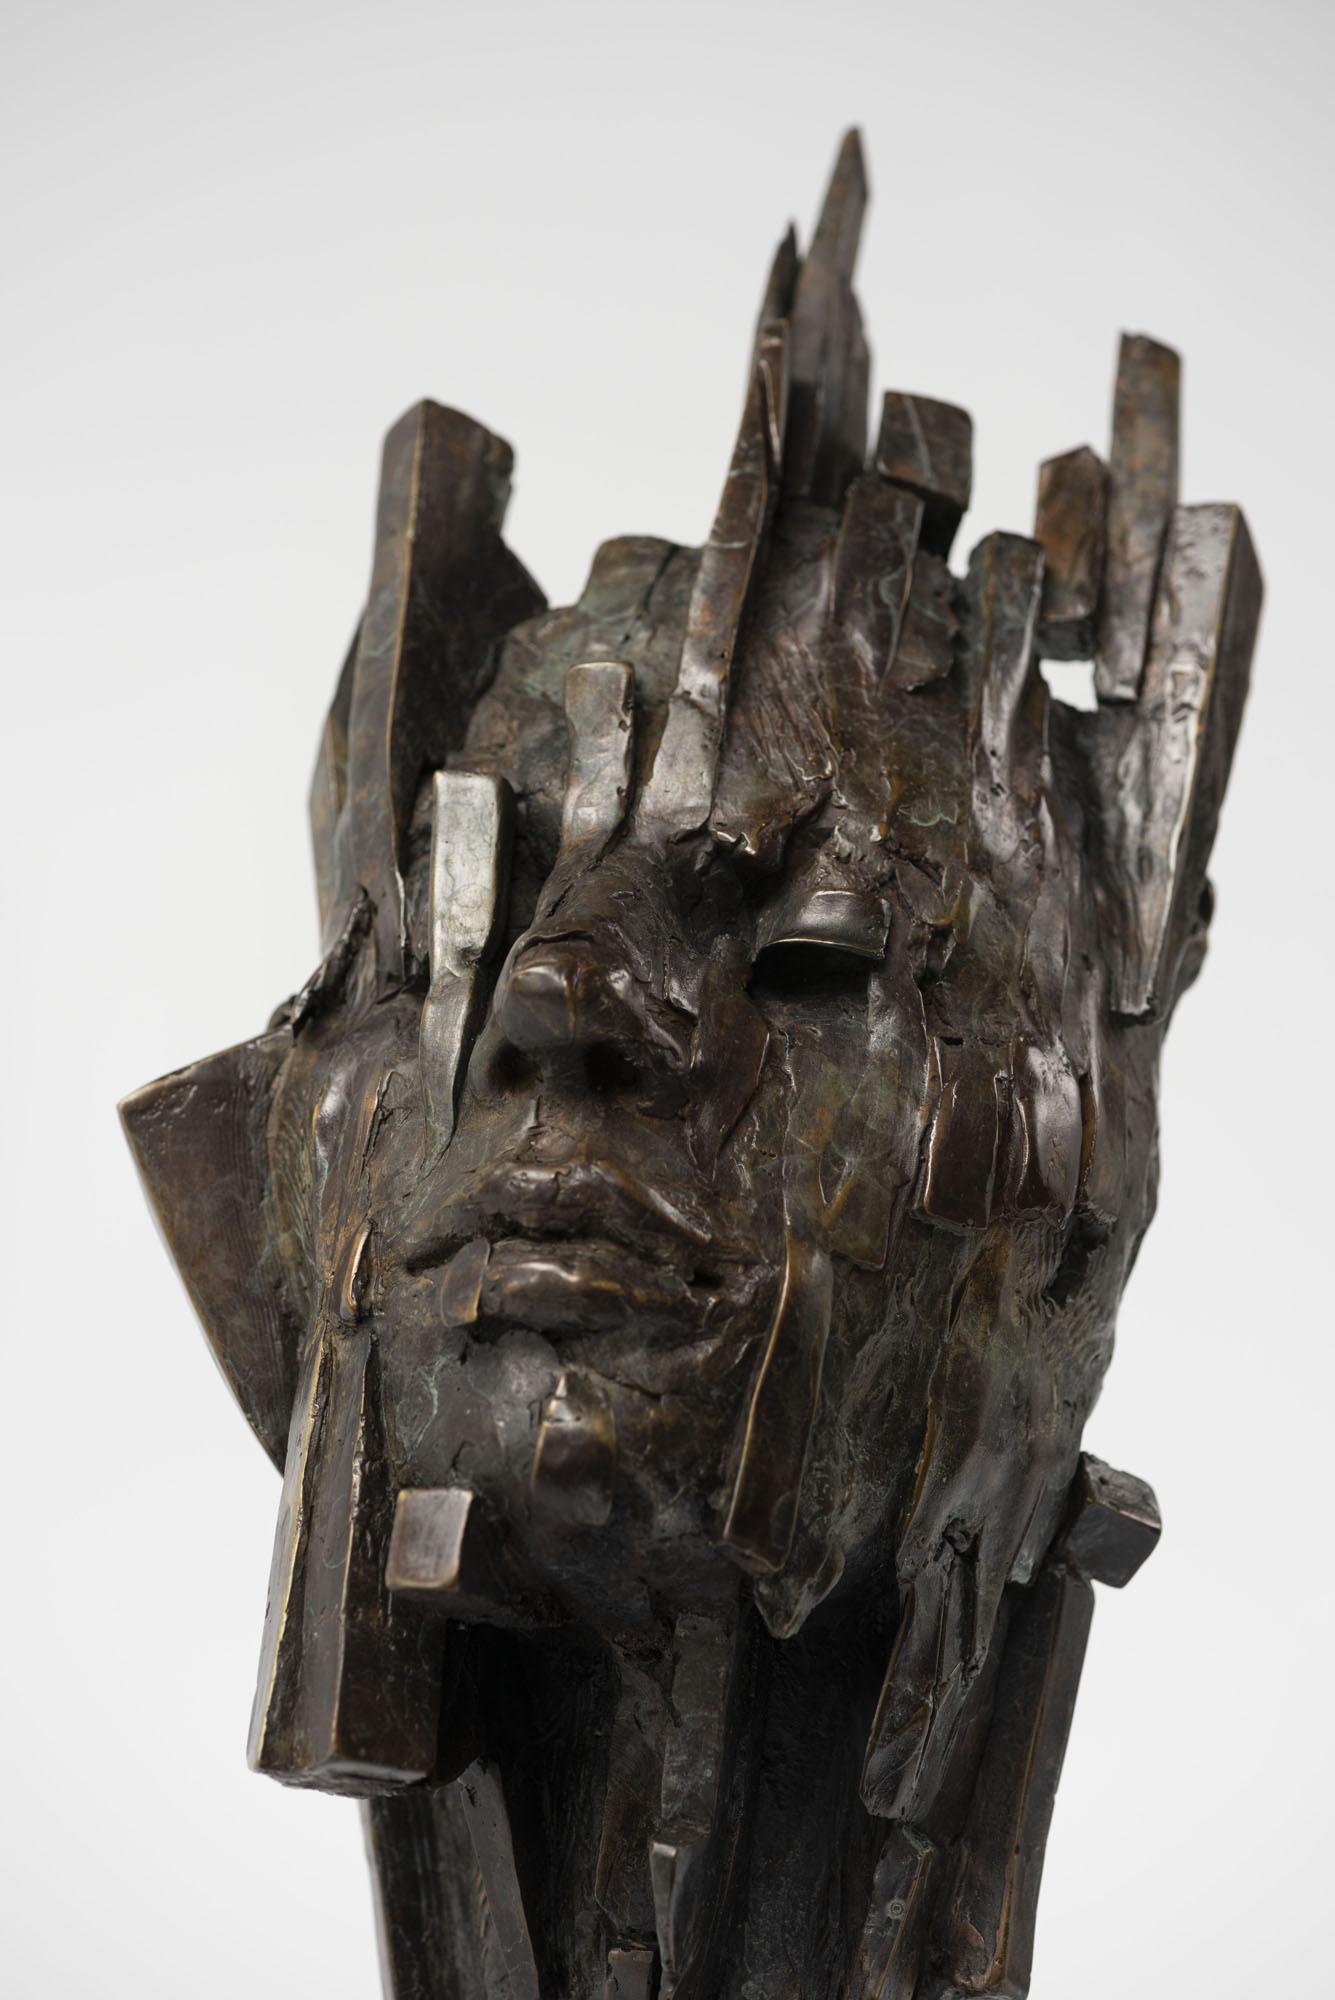 bronze sculpture by Damon Price